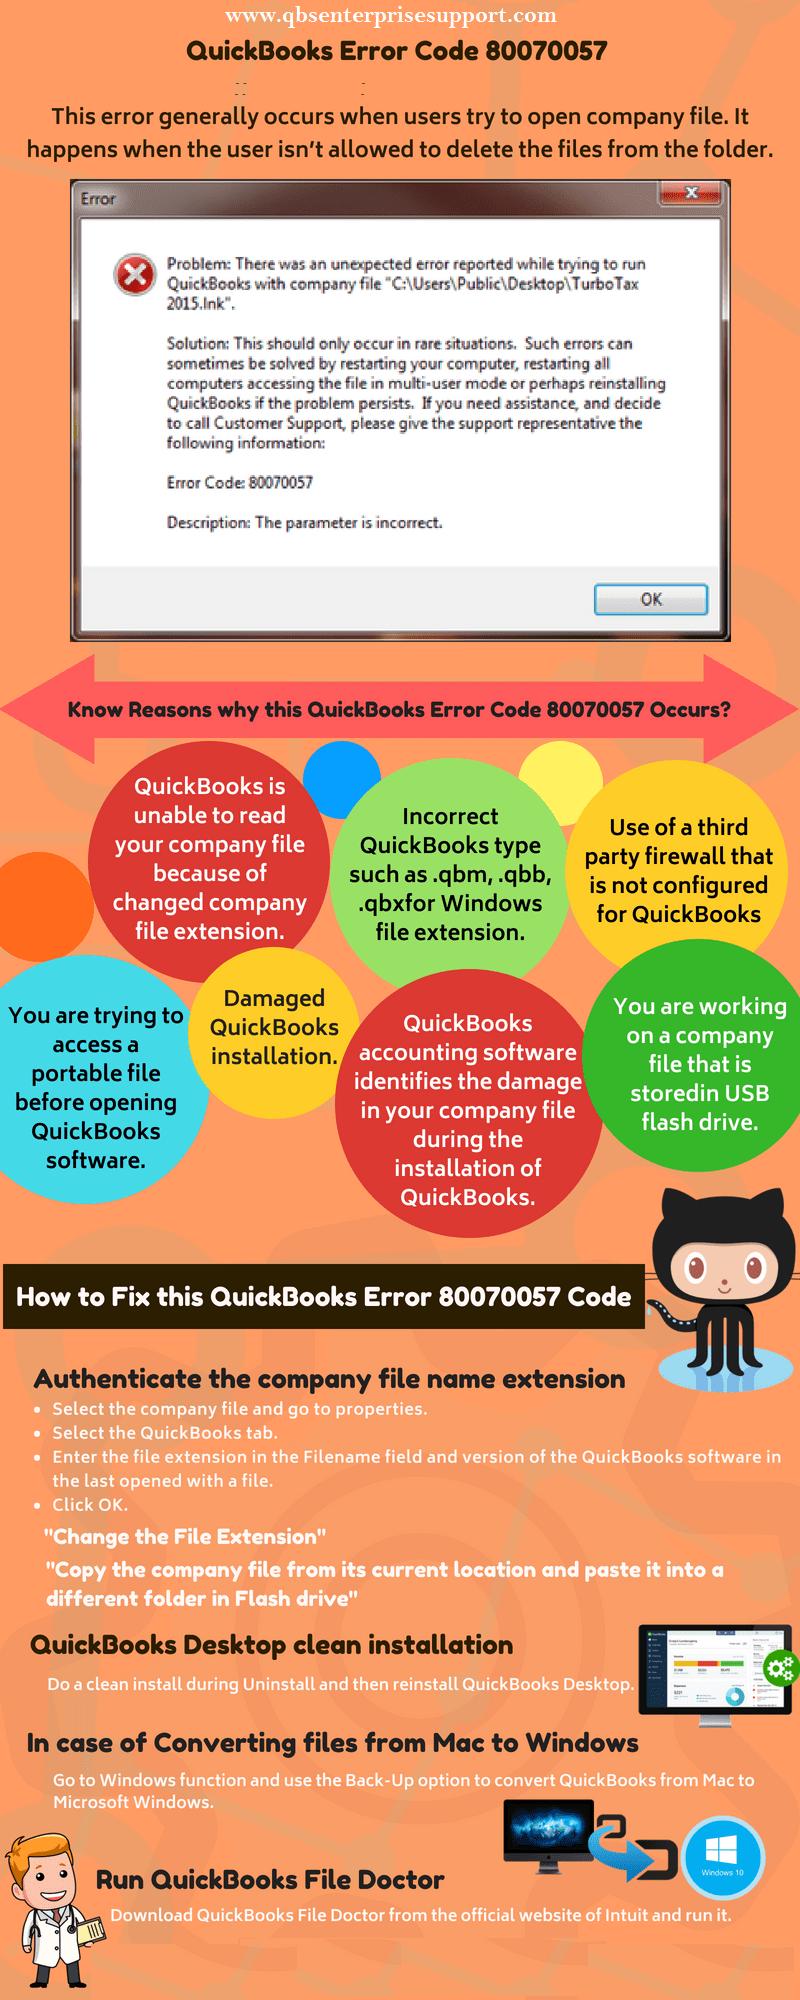 Vest Ways to Resolve QuickBooks Error Code 80070057 - Info-graphic